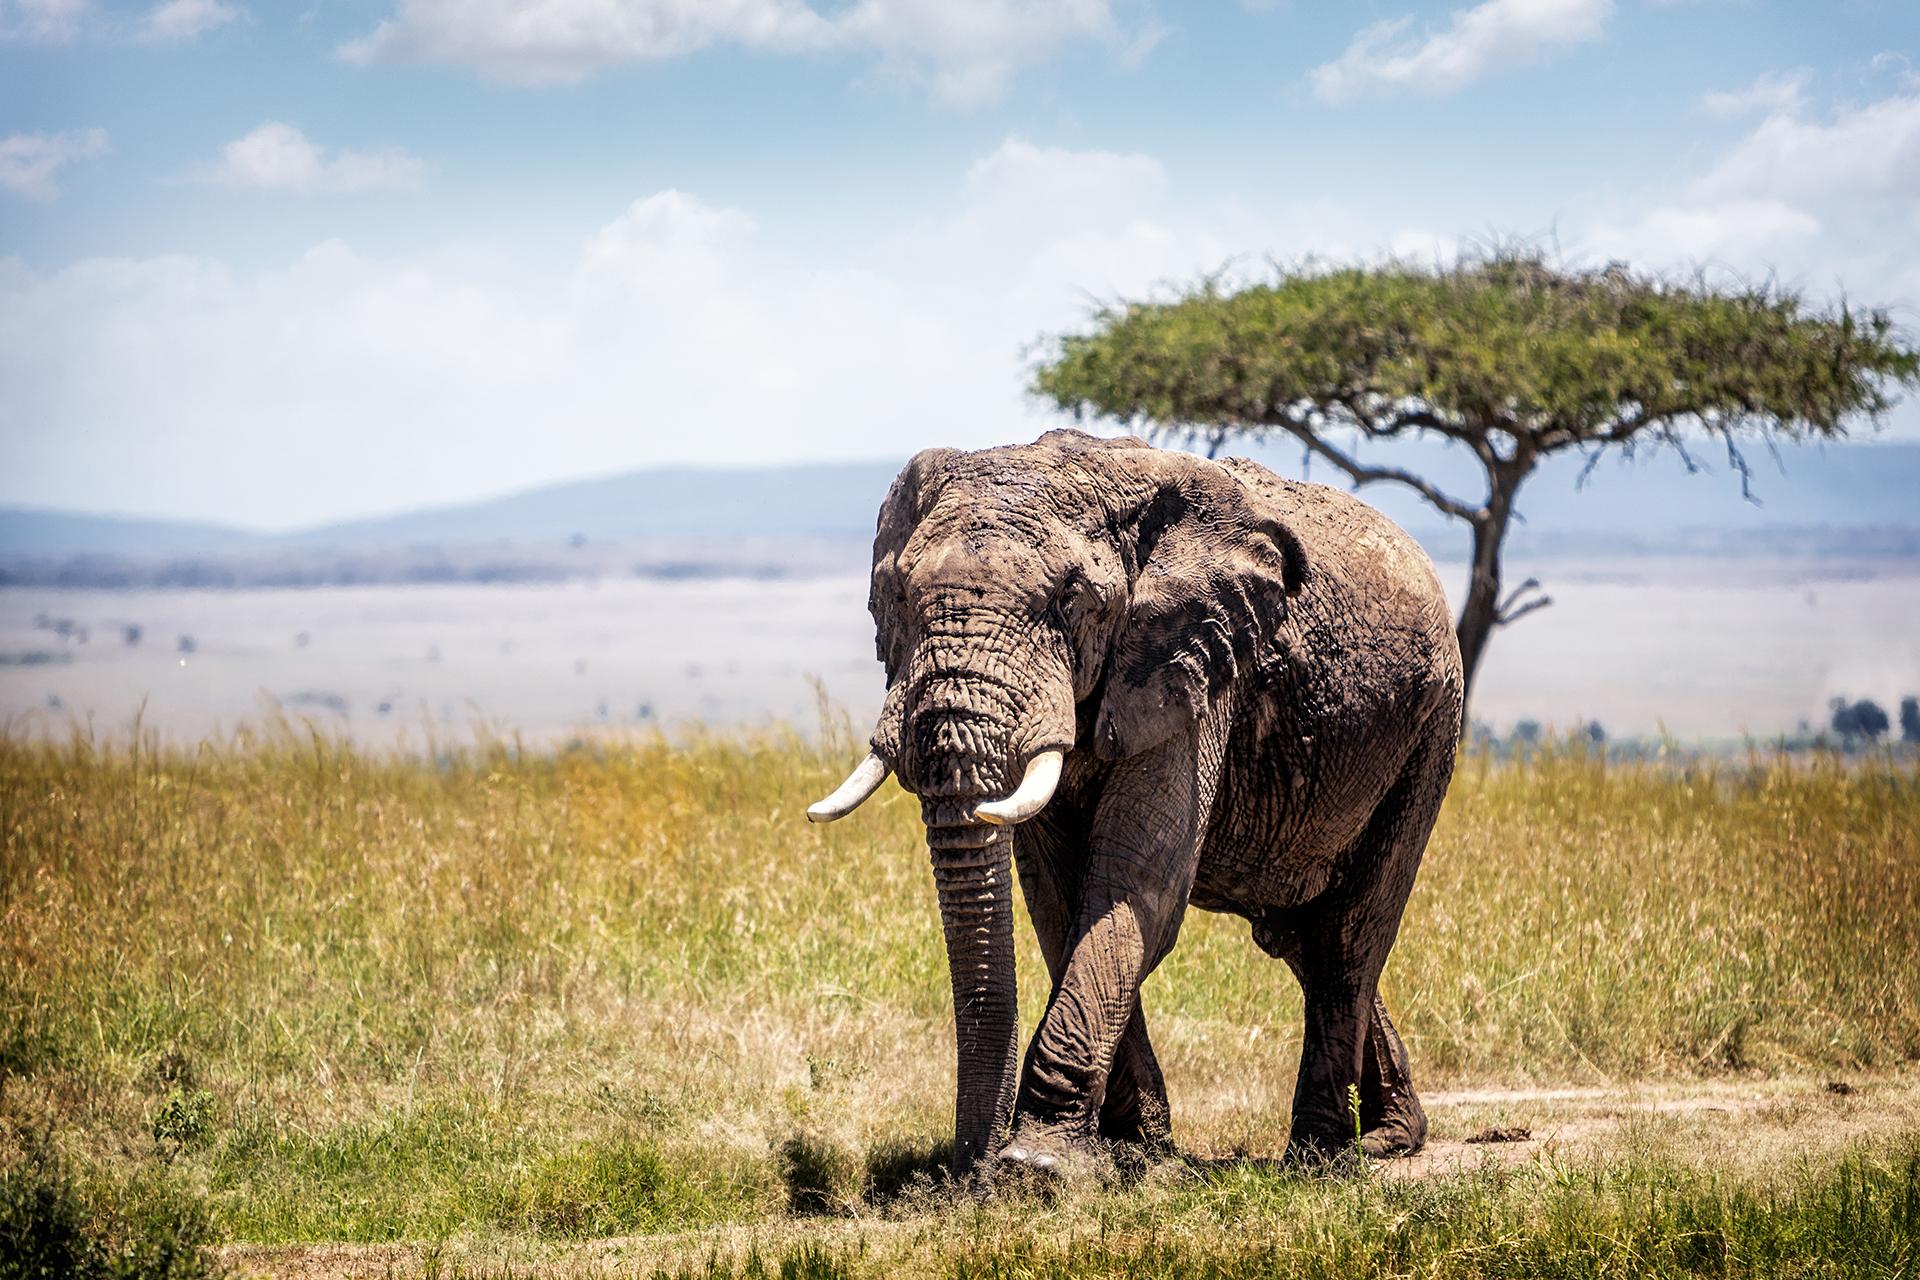 Large Bull Elephant Walking Forward in Kenya.jpg